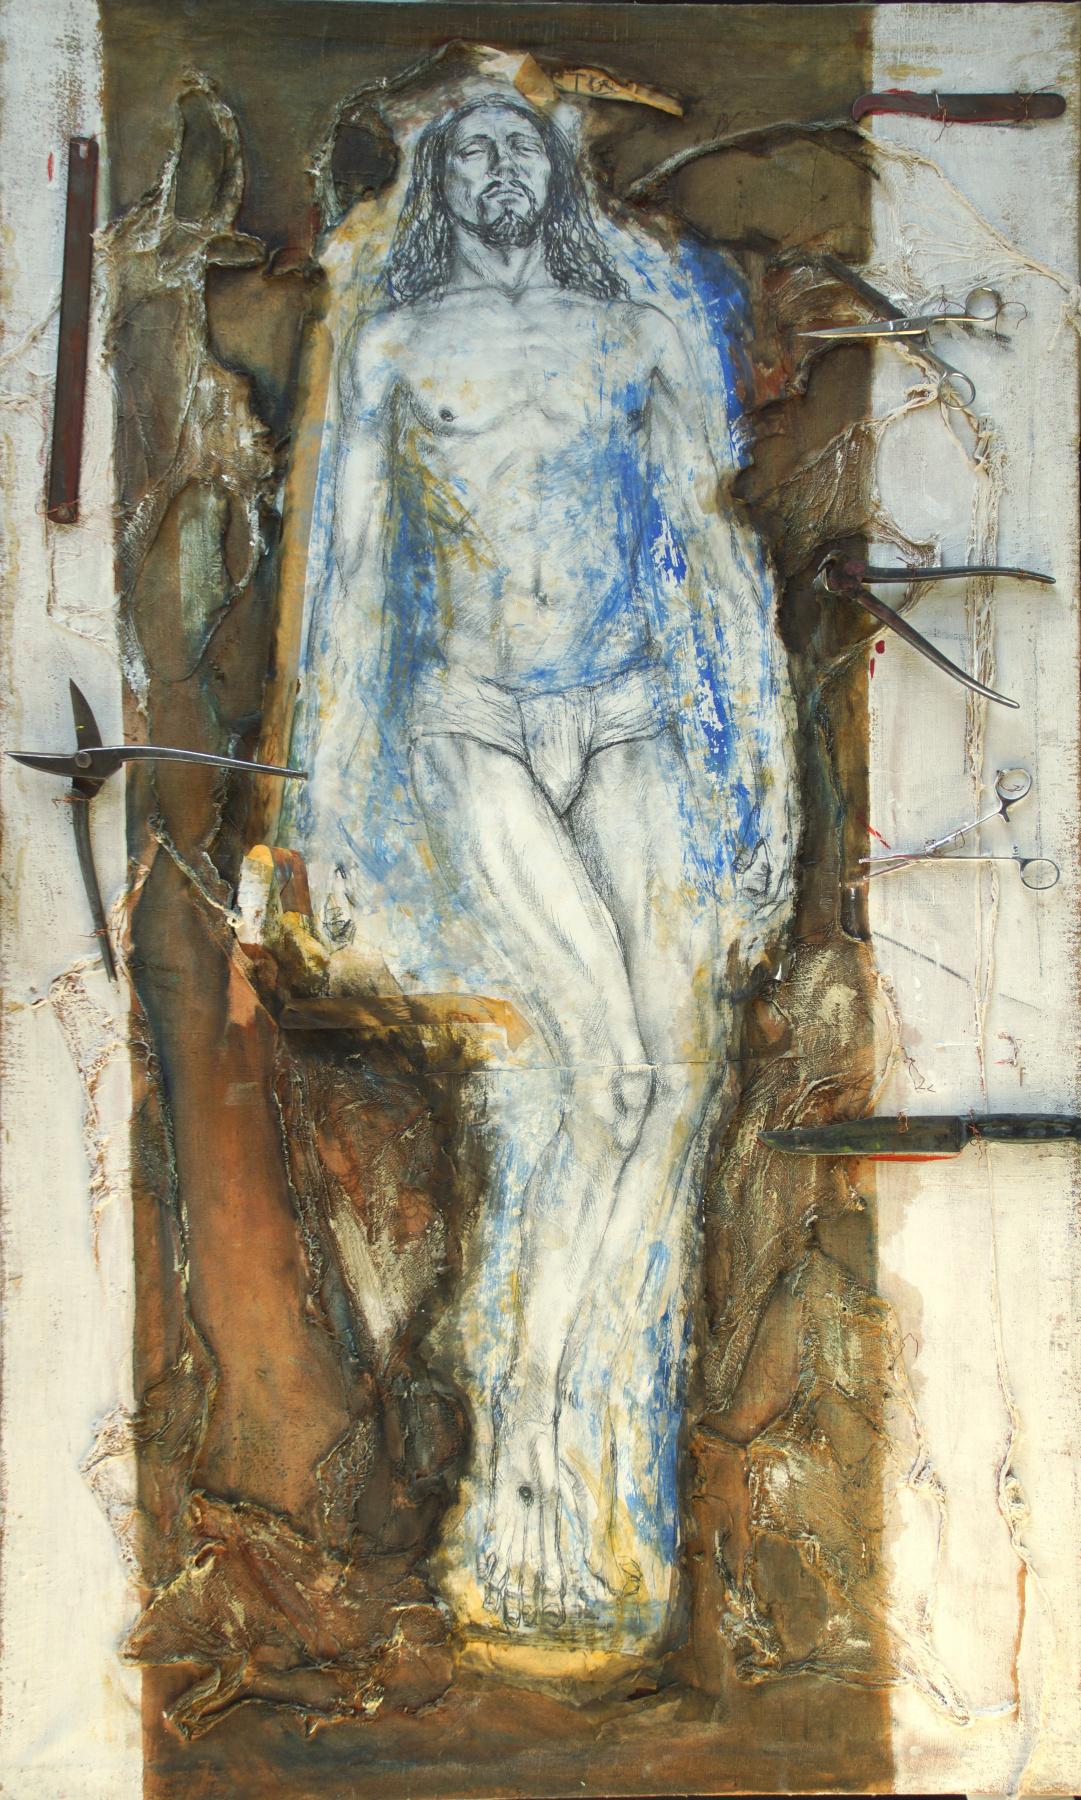 Sergey Viktorovich Solomatin. Tools and Christ